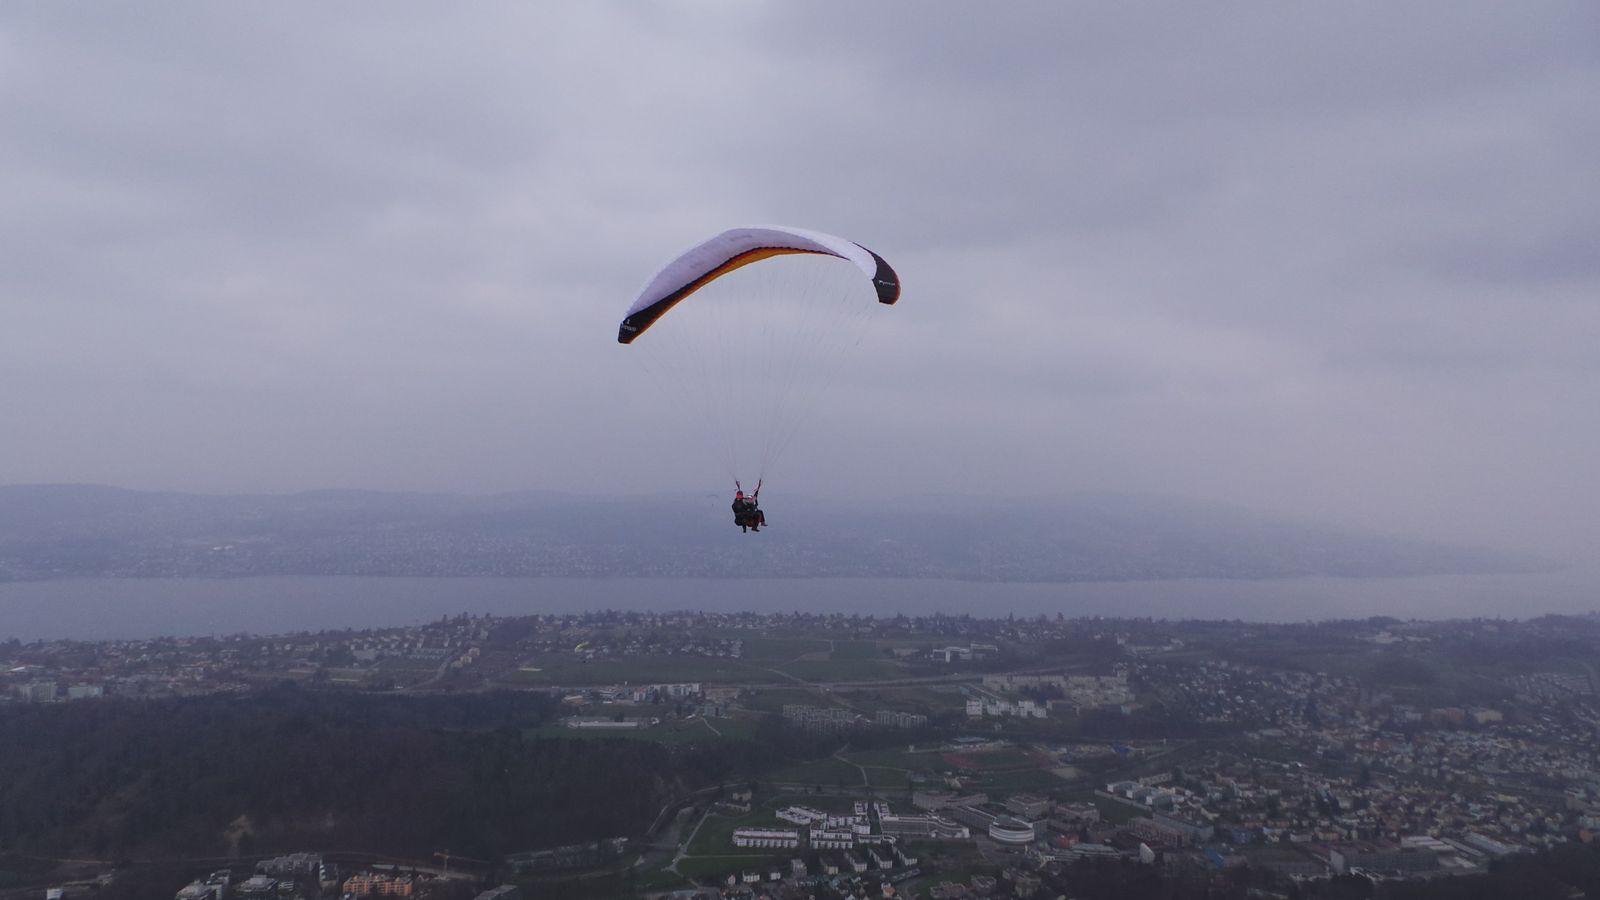 Belle petite vue de Zurich!